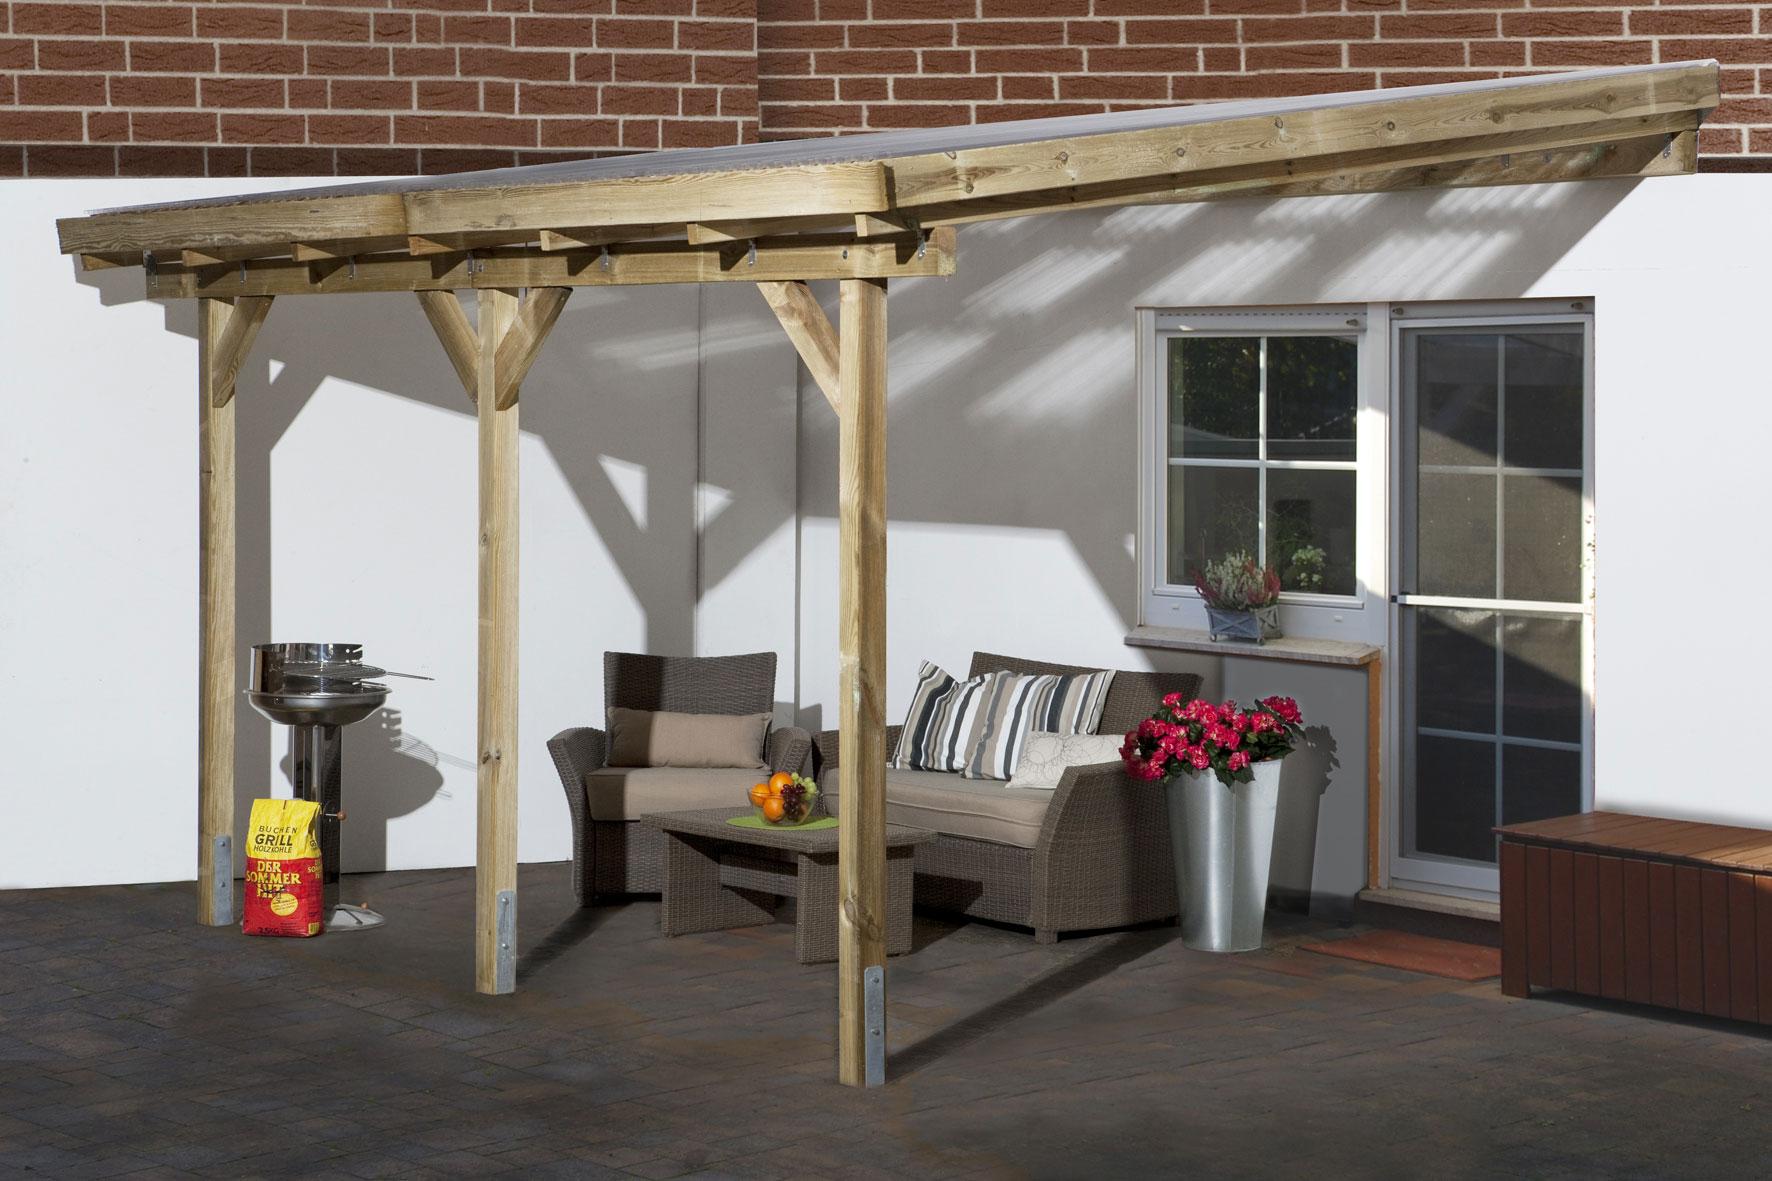 stunning anlehn carport holz photos. Black Bedroom Furniture Sets. Home Design Ideas